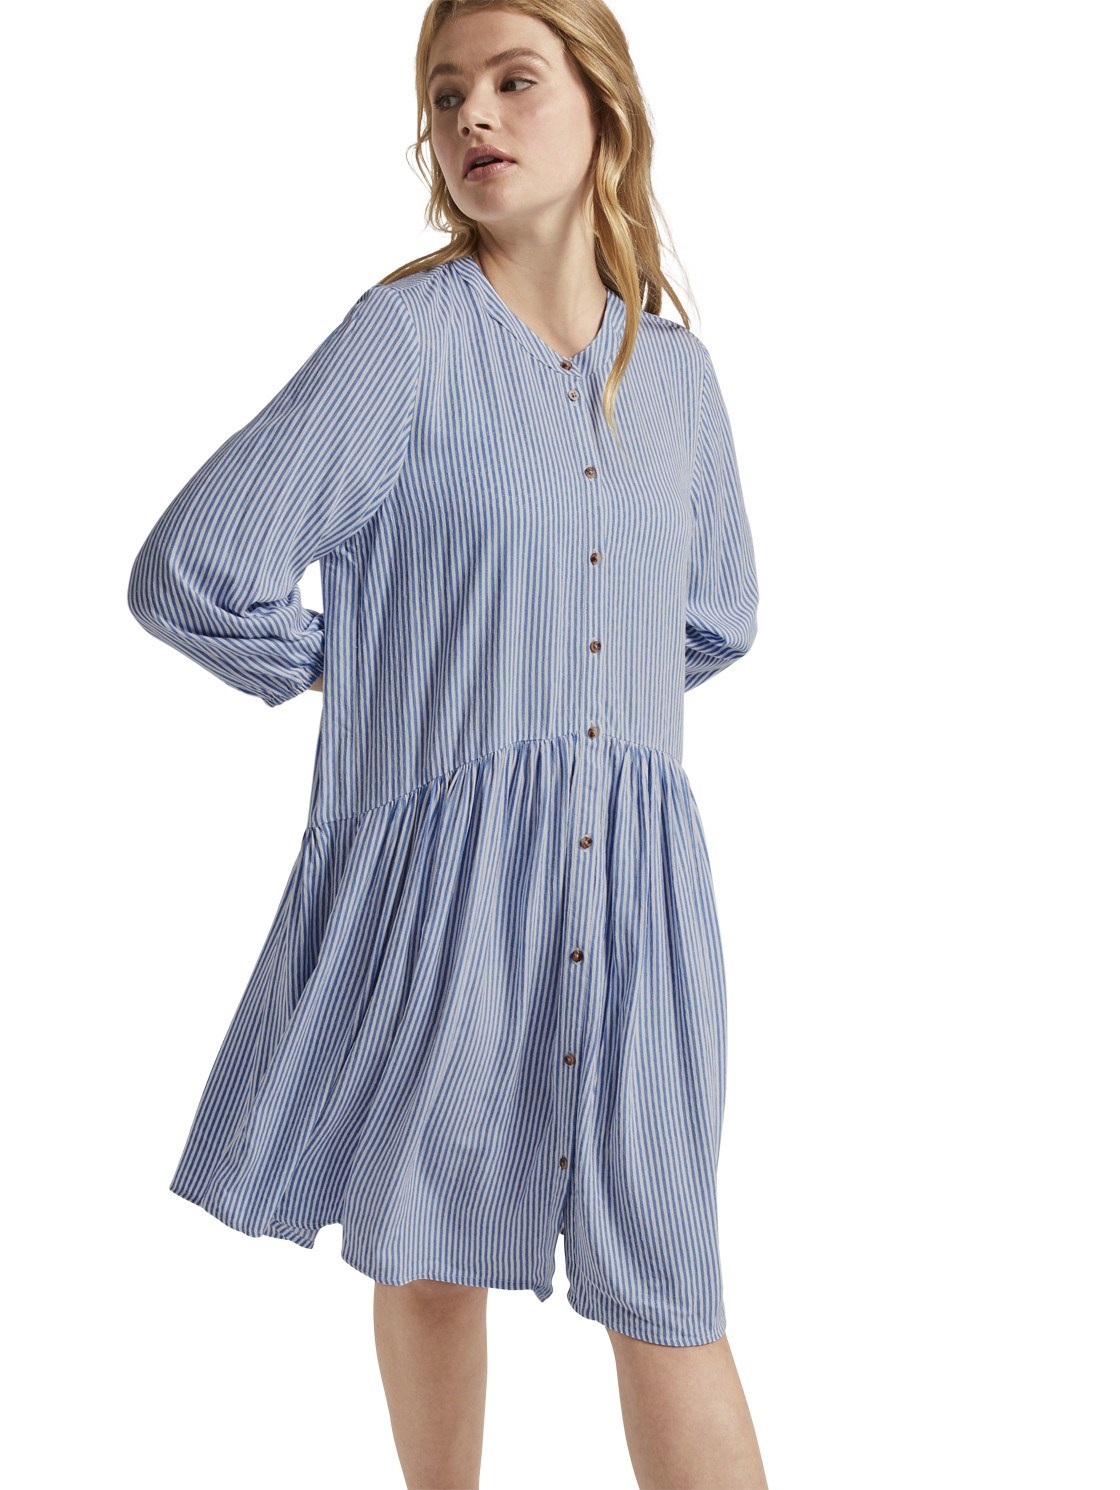 Tom Tailor Denim Kleid 10589373  Kleider  Damen  Wöhrl